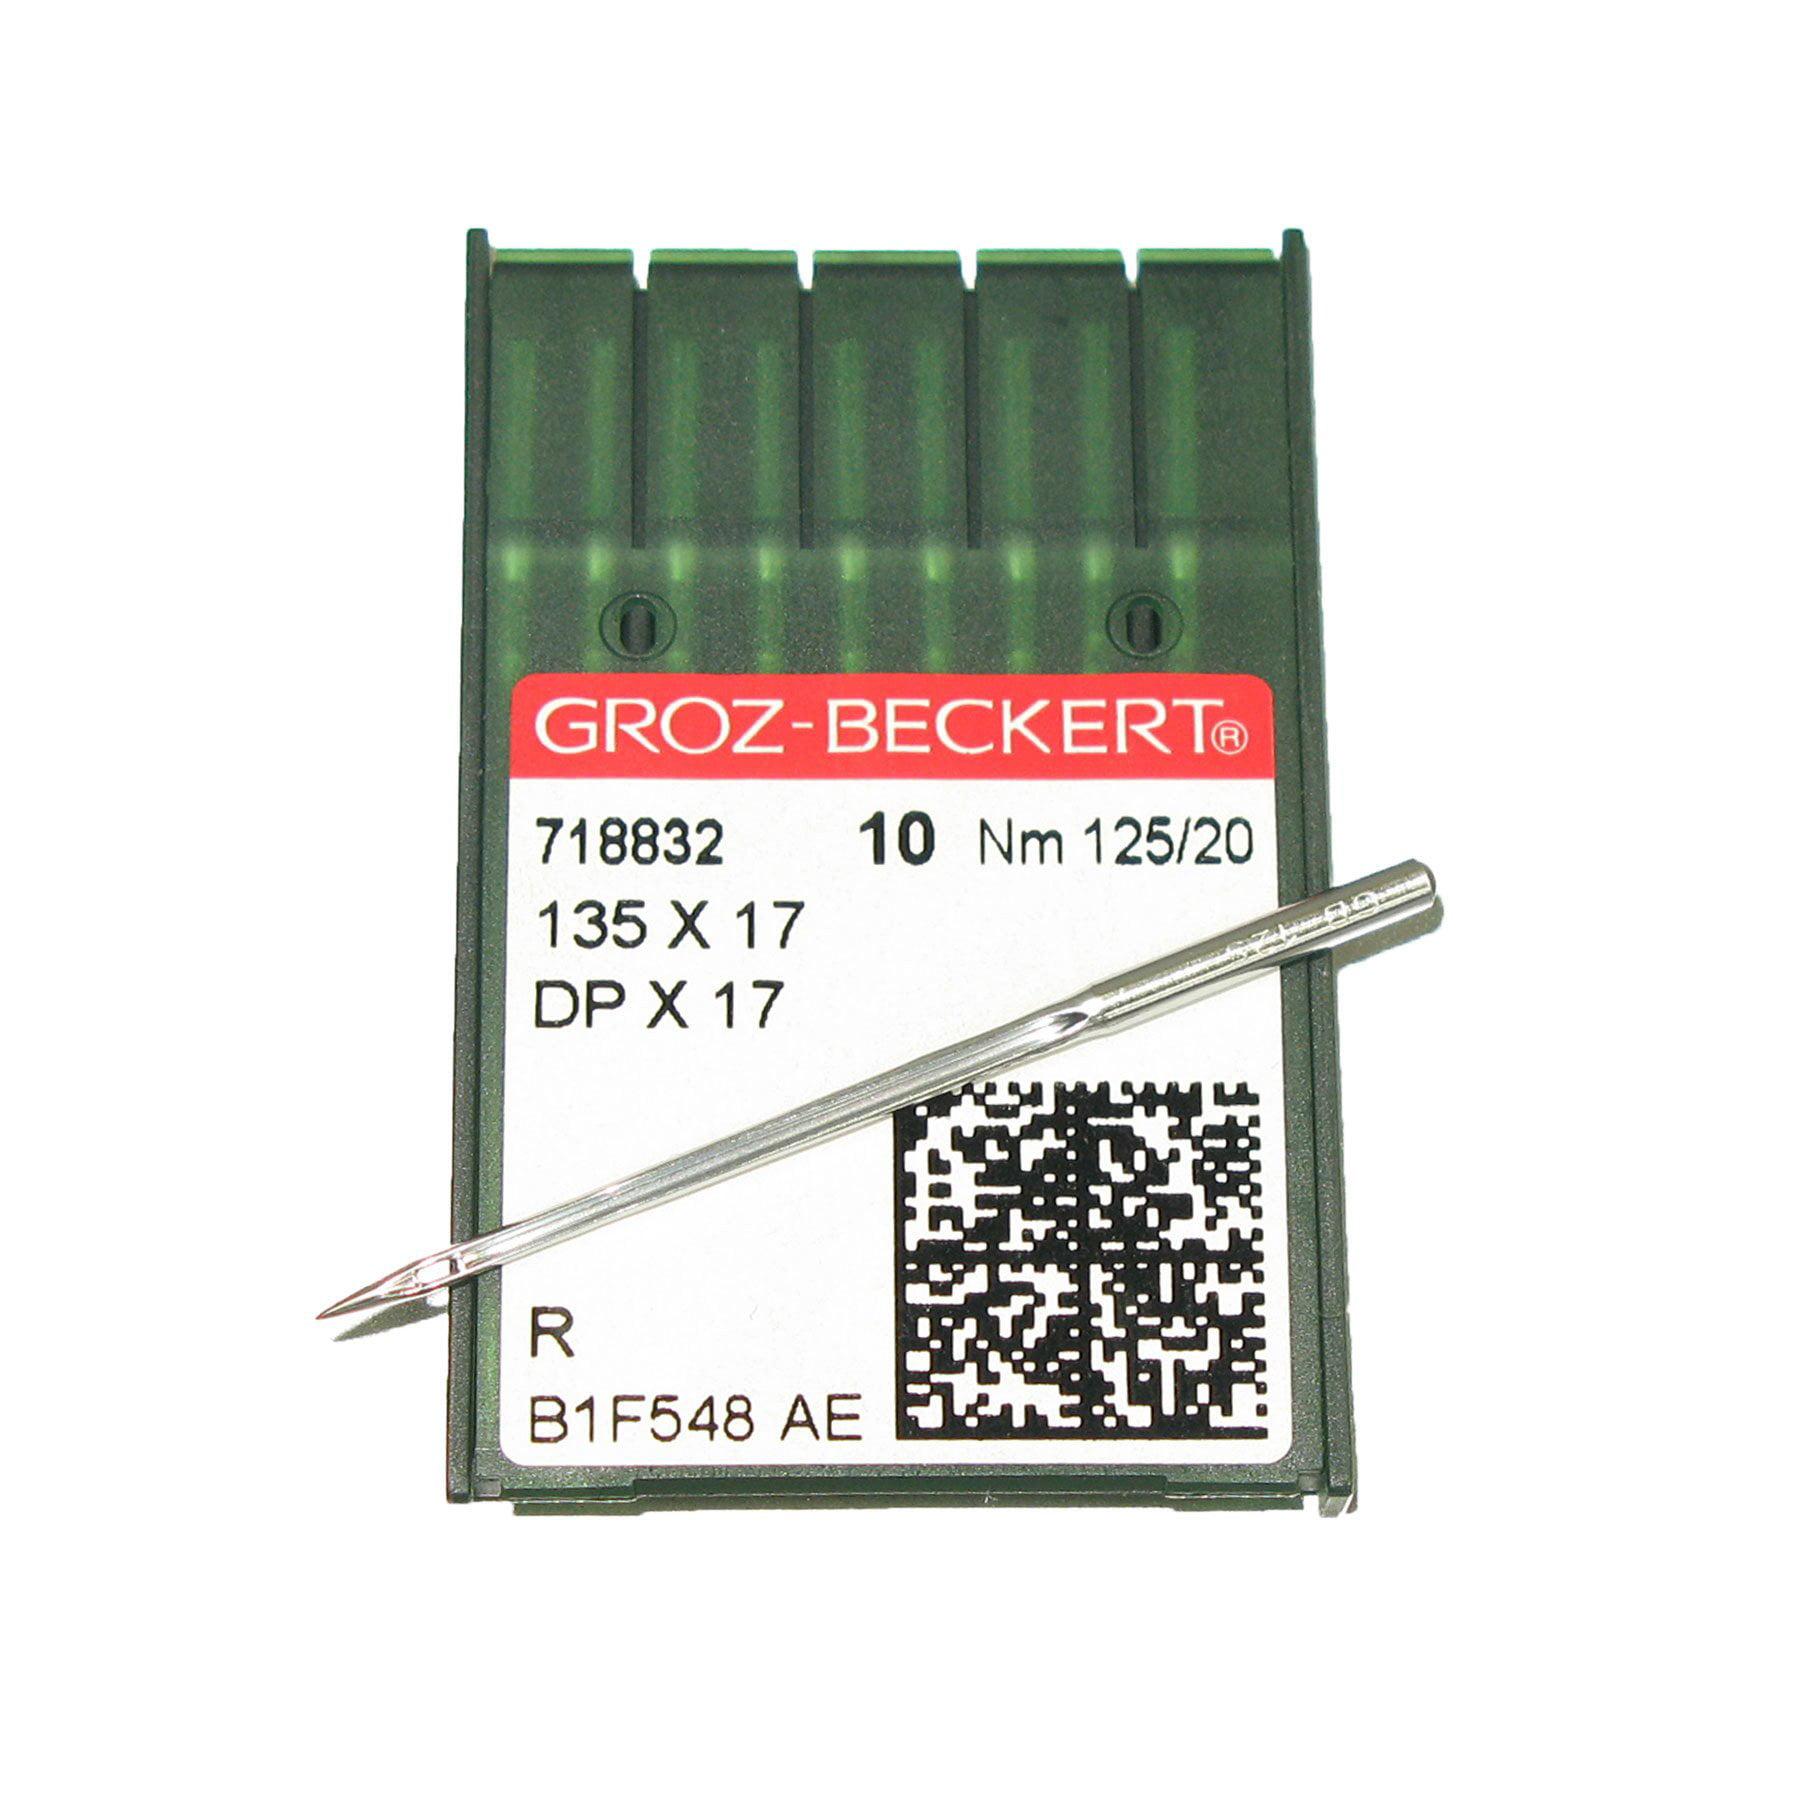 Groz-Beckert 135 X 17 #20 Sewing Machine Needles